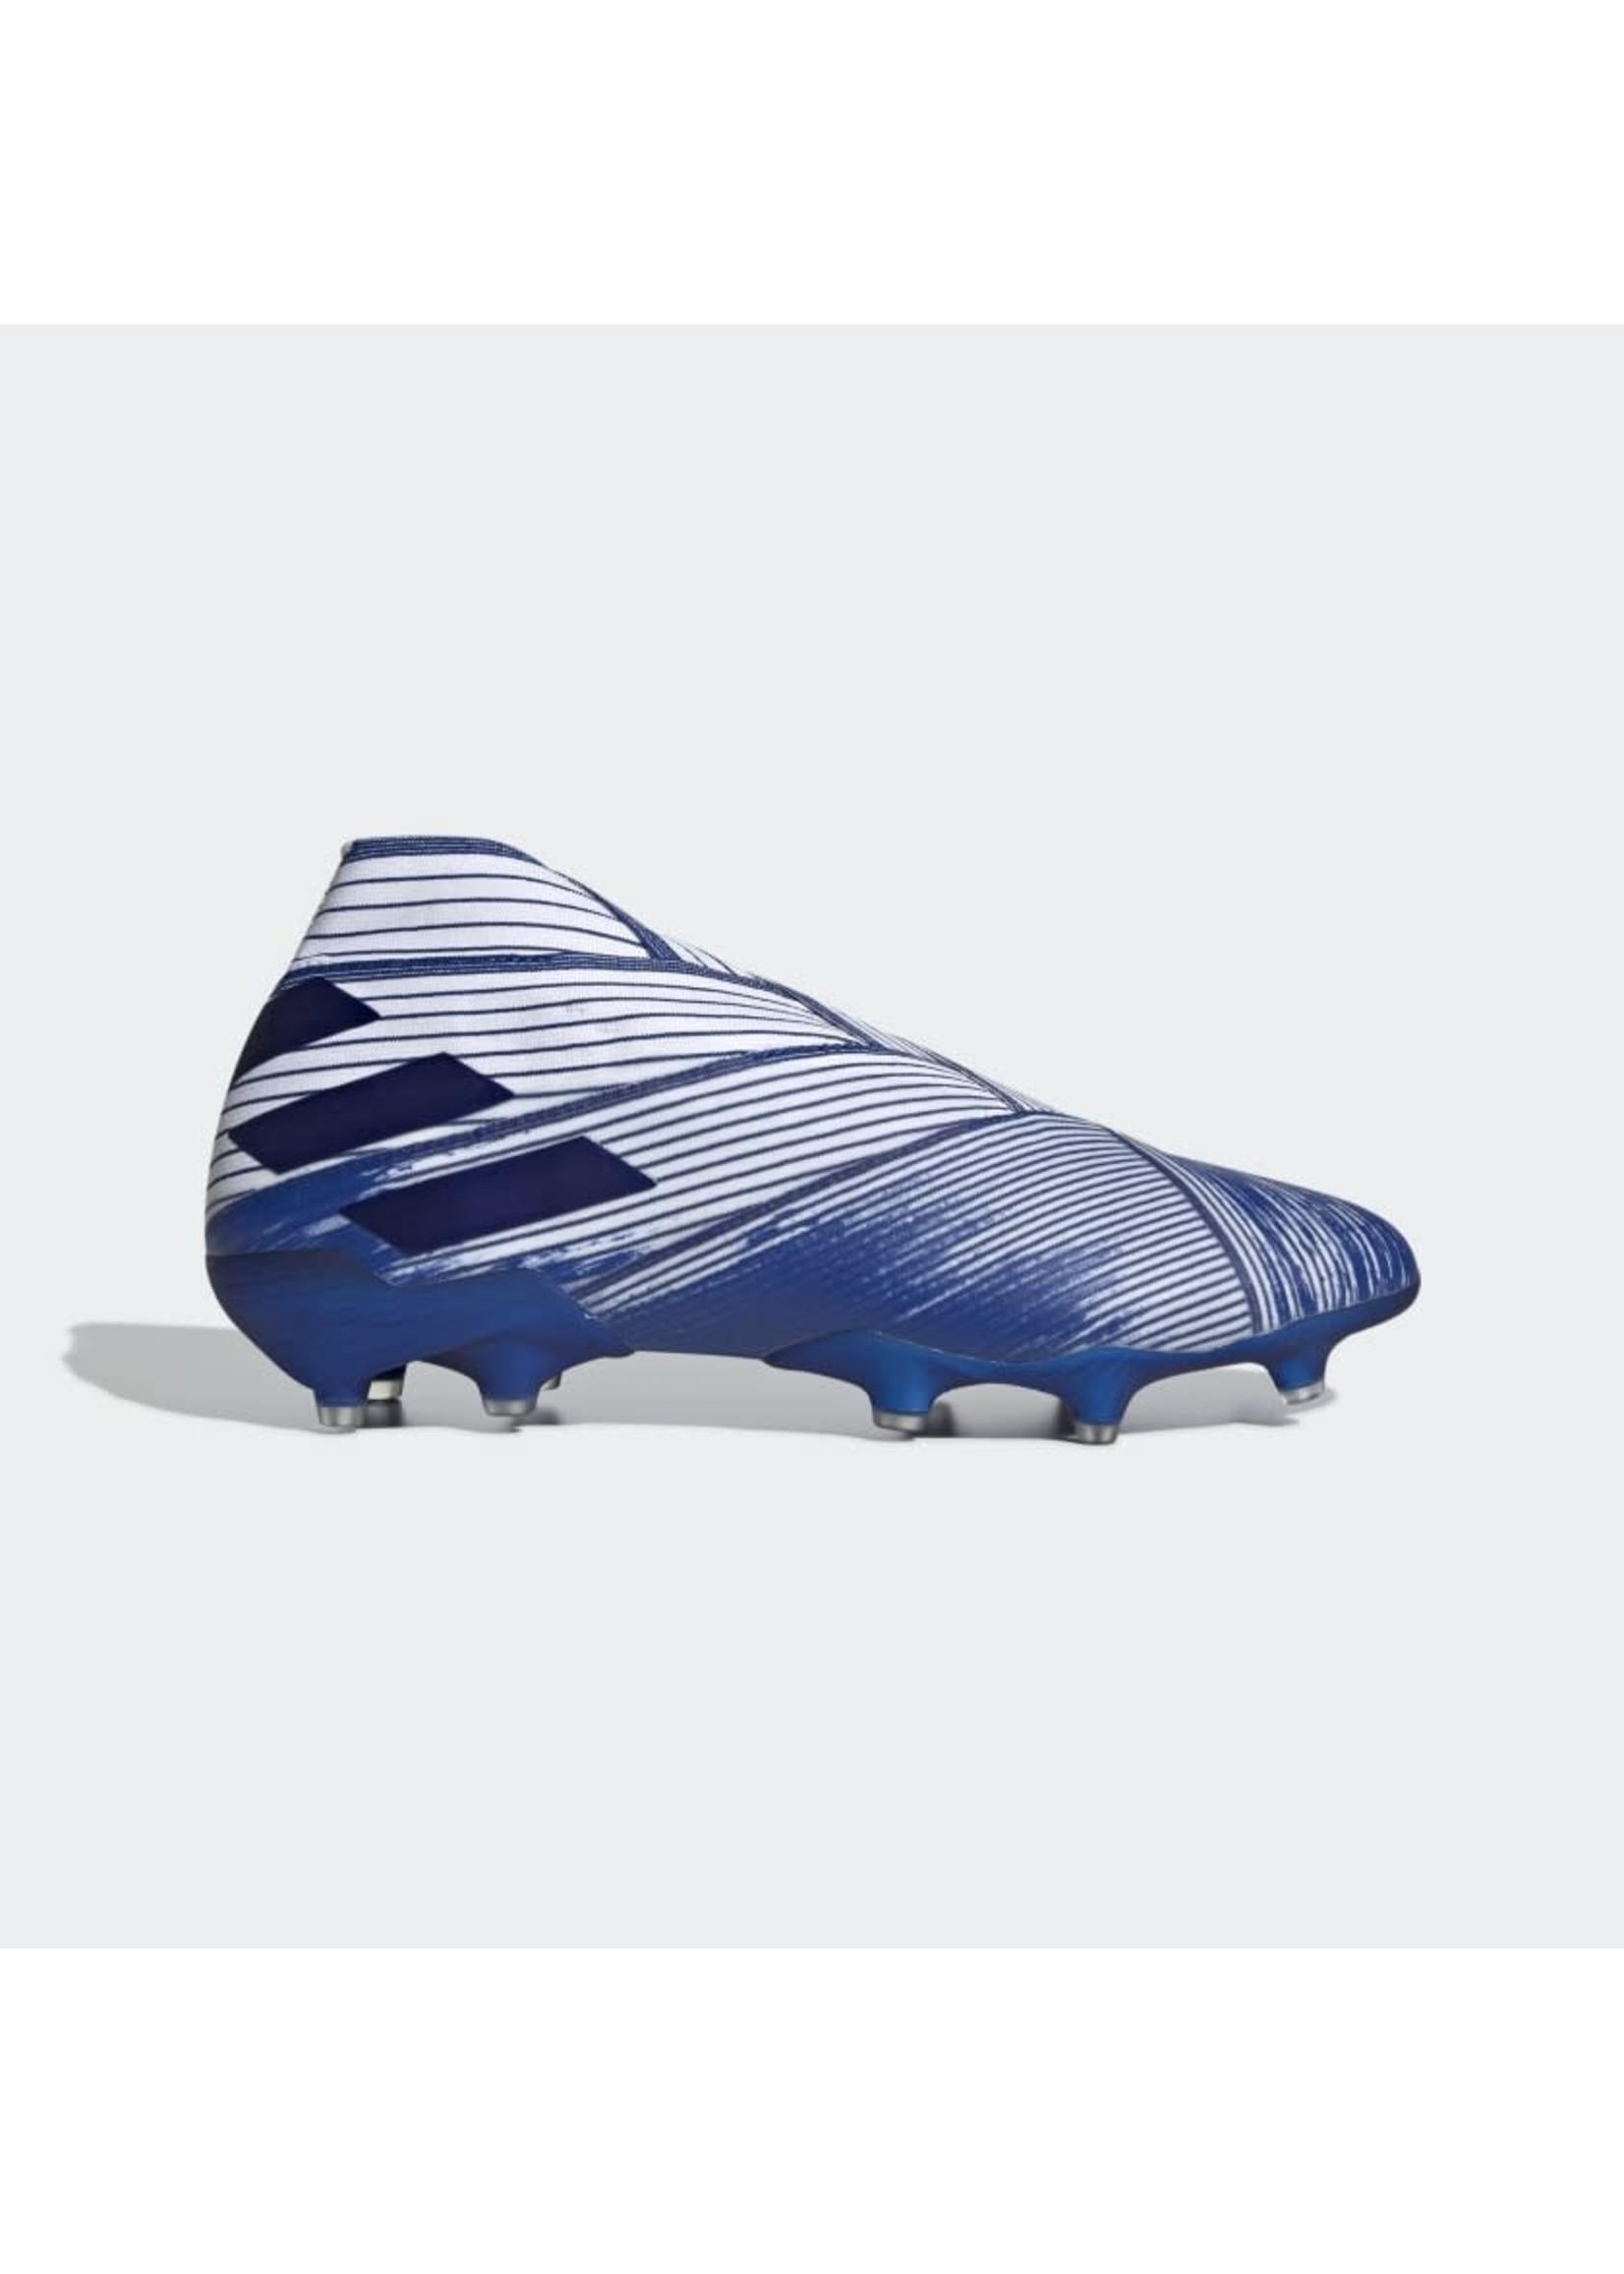 Adidas Nemeziz 19+ FG - Blue/White